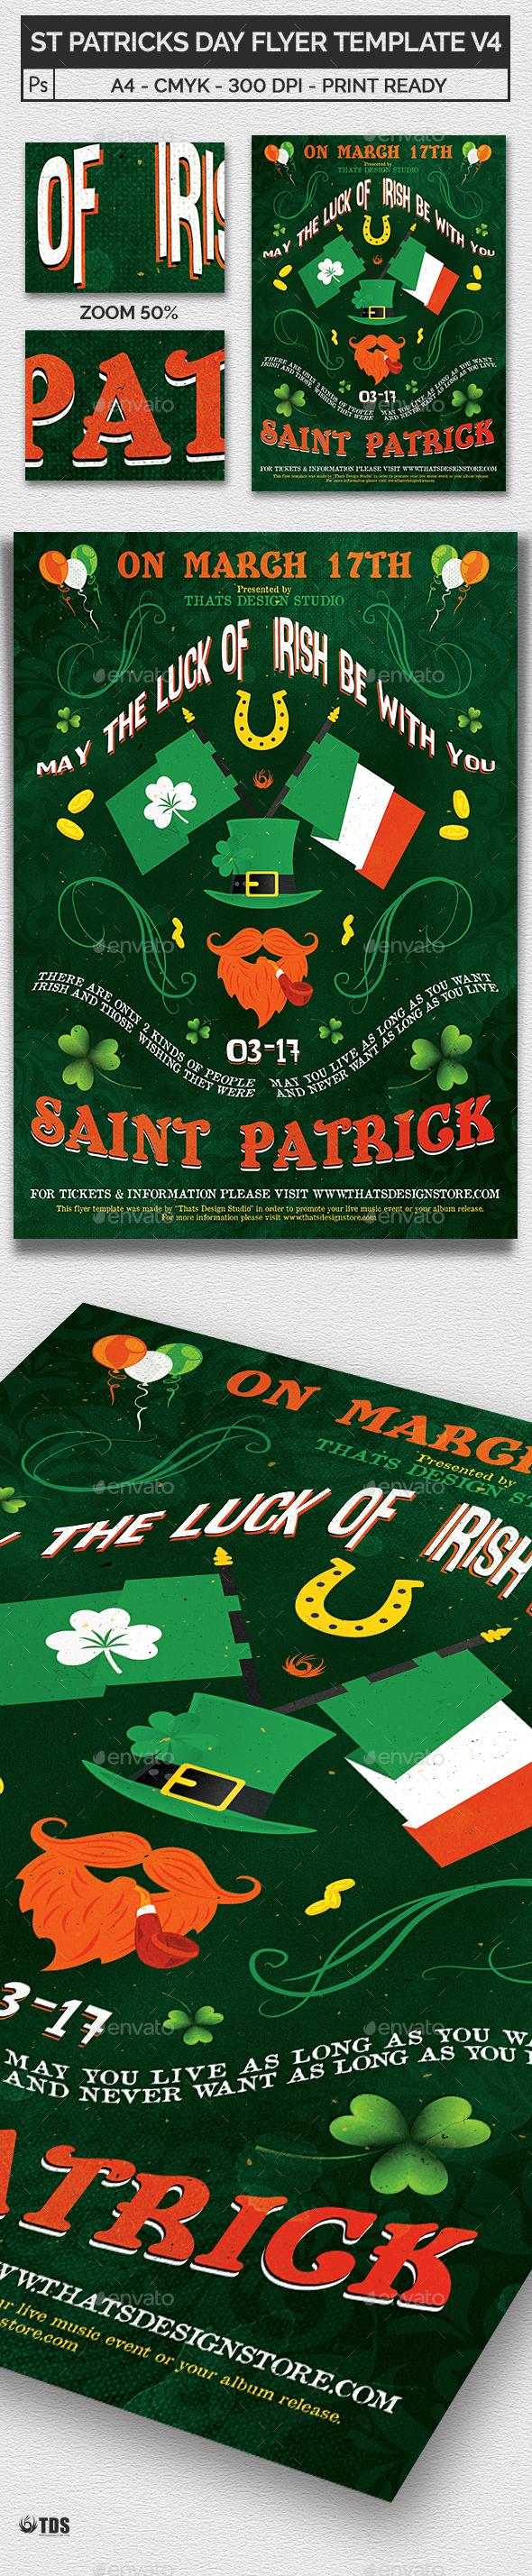 Saint Patricks Day Flyer Template V4 - Holidays Events